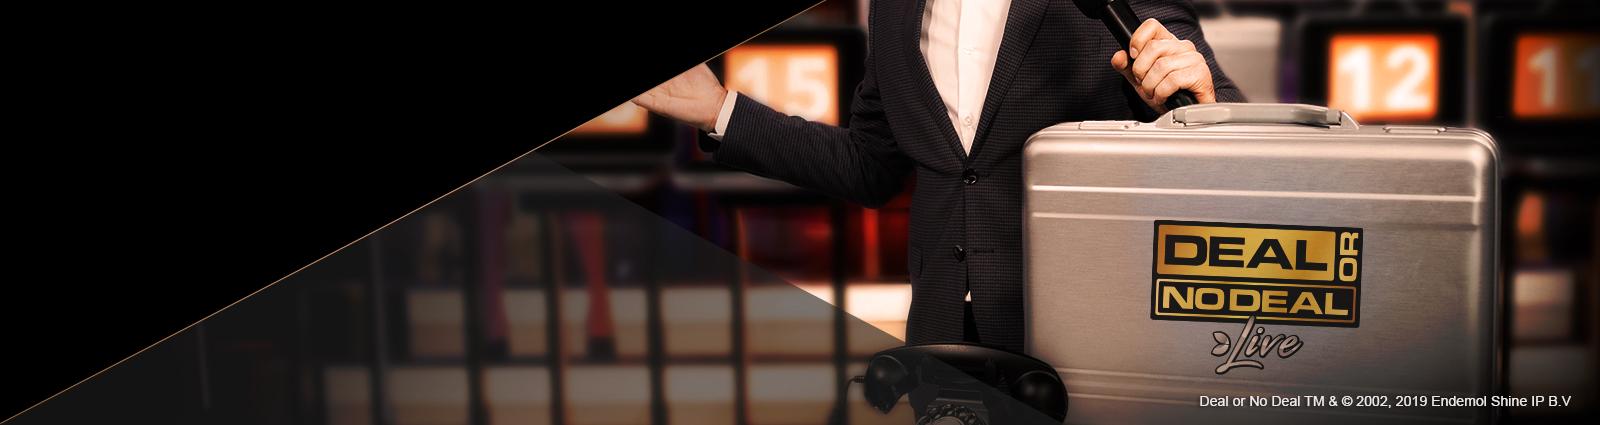 storspiller-mobil-live-casino